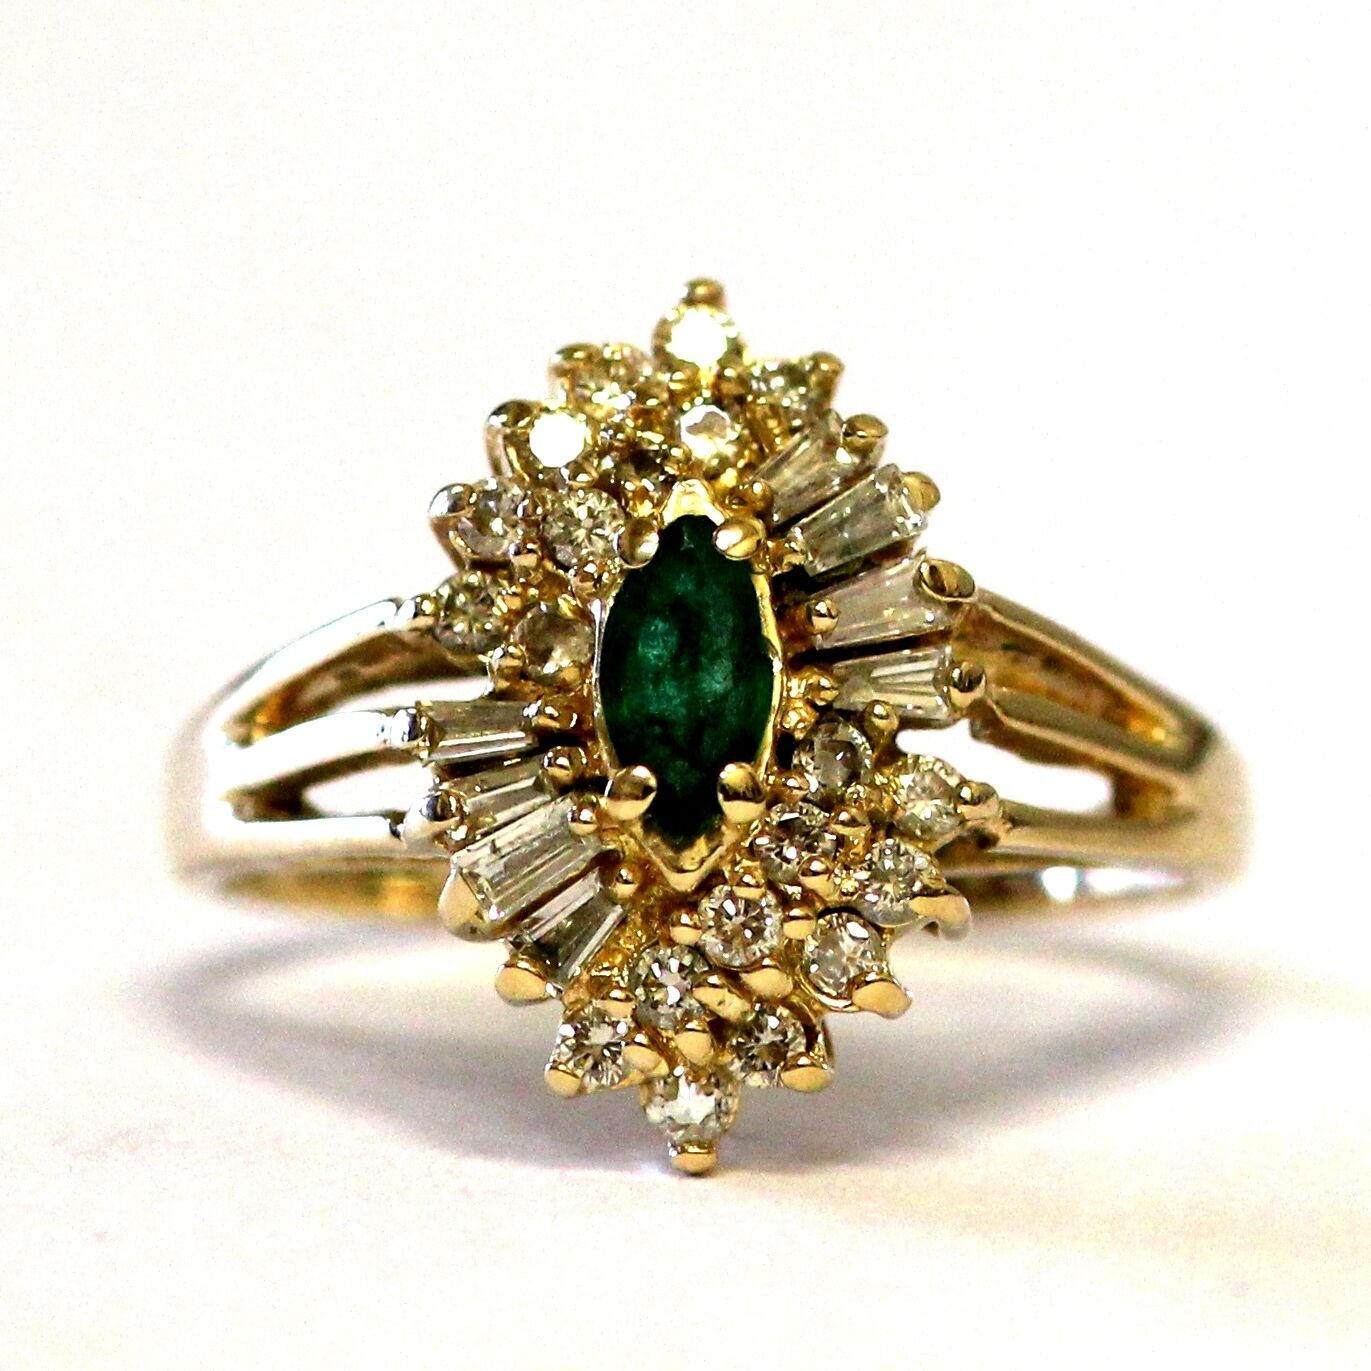 14k yellow gold women's VS H diamond .46ct emerald ring 4.5g vintage estate